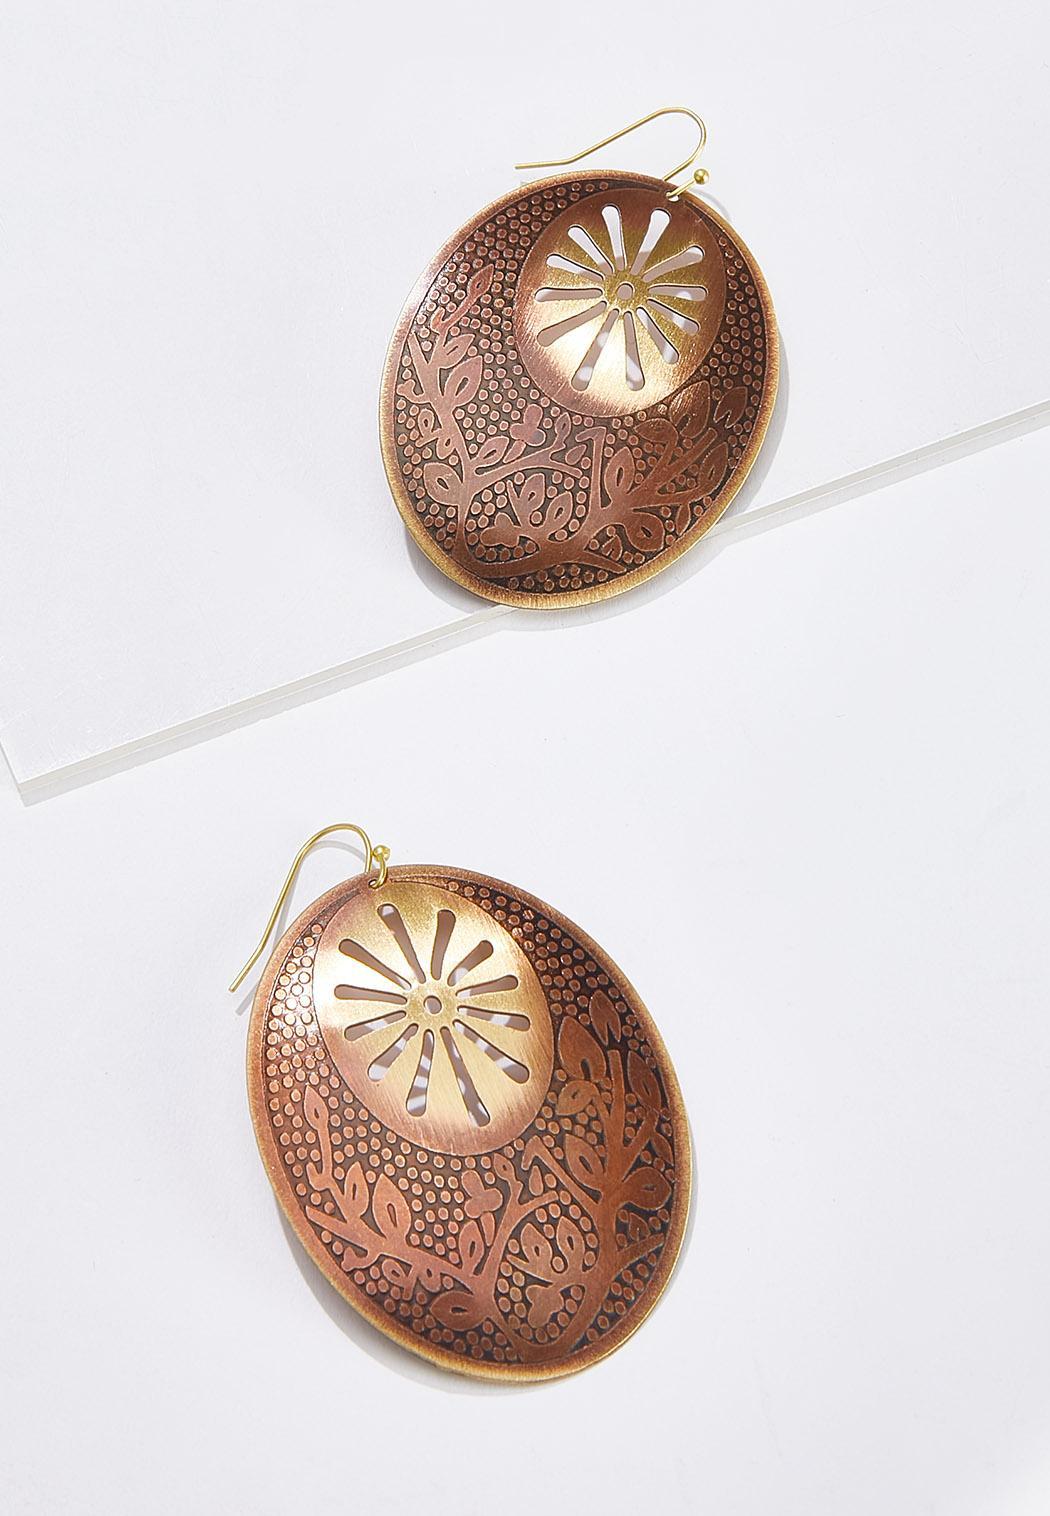 Oval Sunburst Earrings